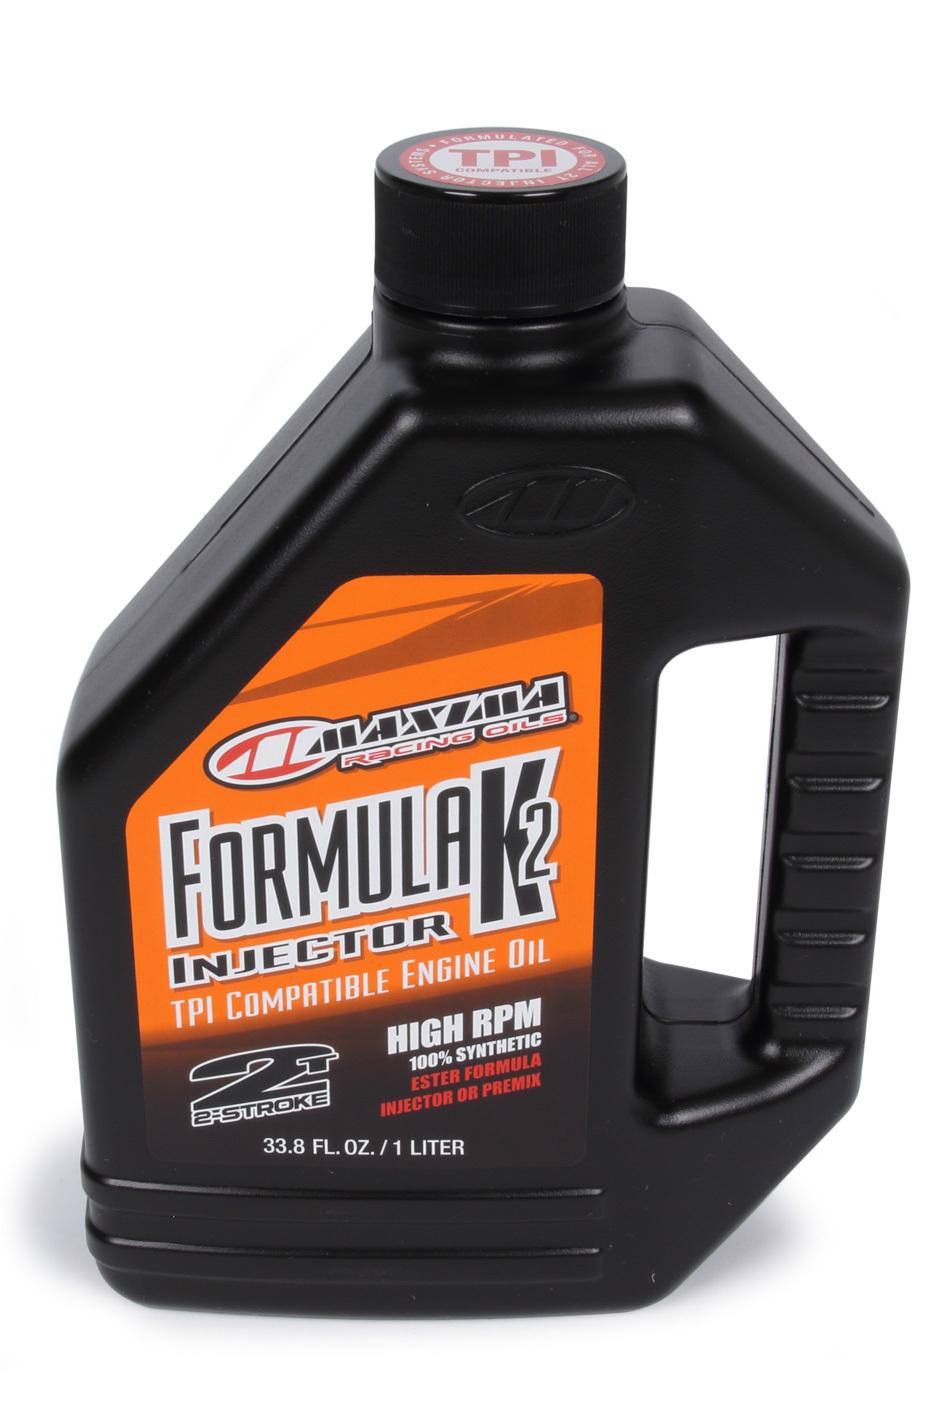 Maxima Racing Oils Formula K2 Injector 2-St roke Oil 1 Liter